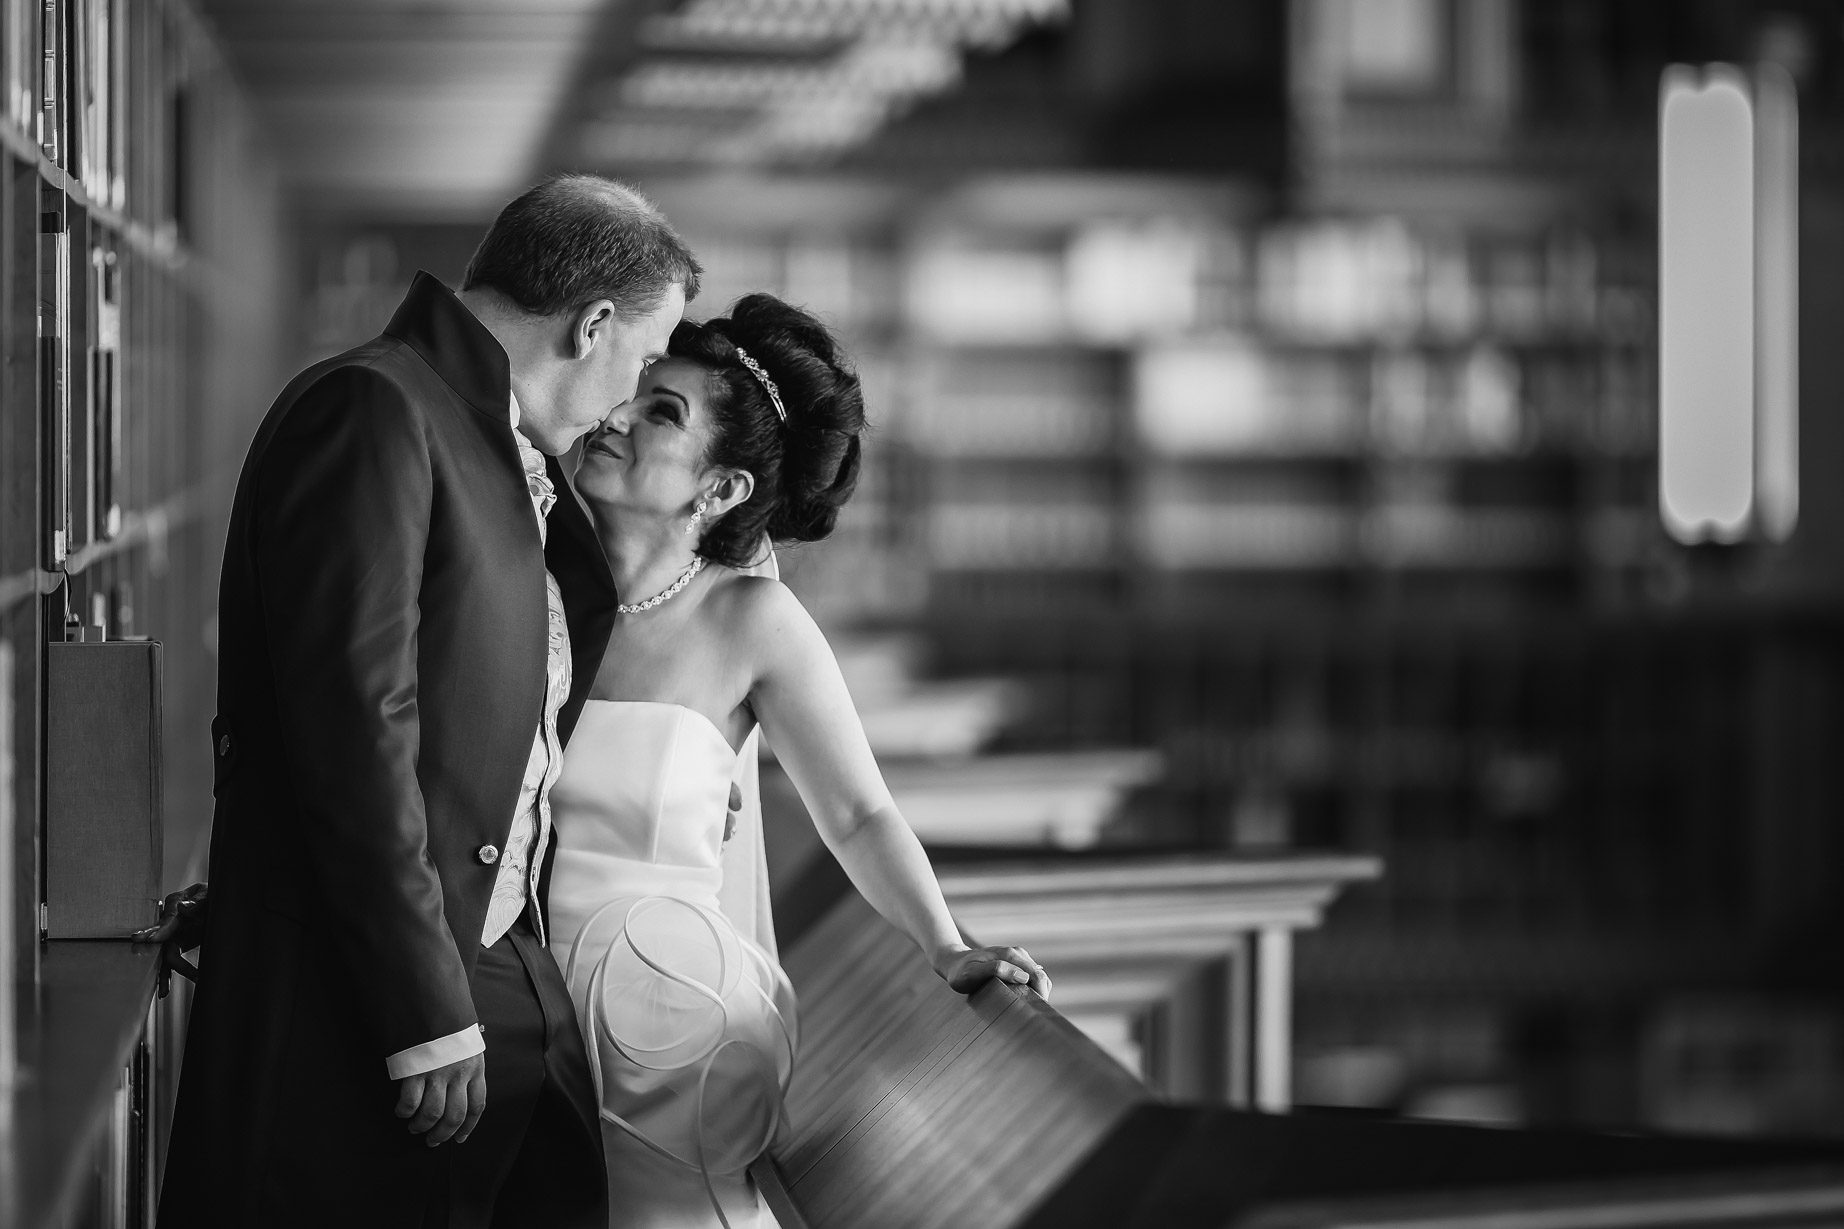 mariage-bibliotheque-seance-photo.jpg